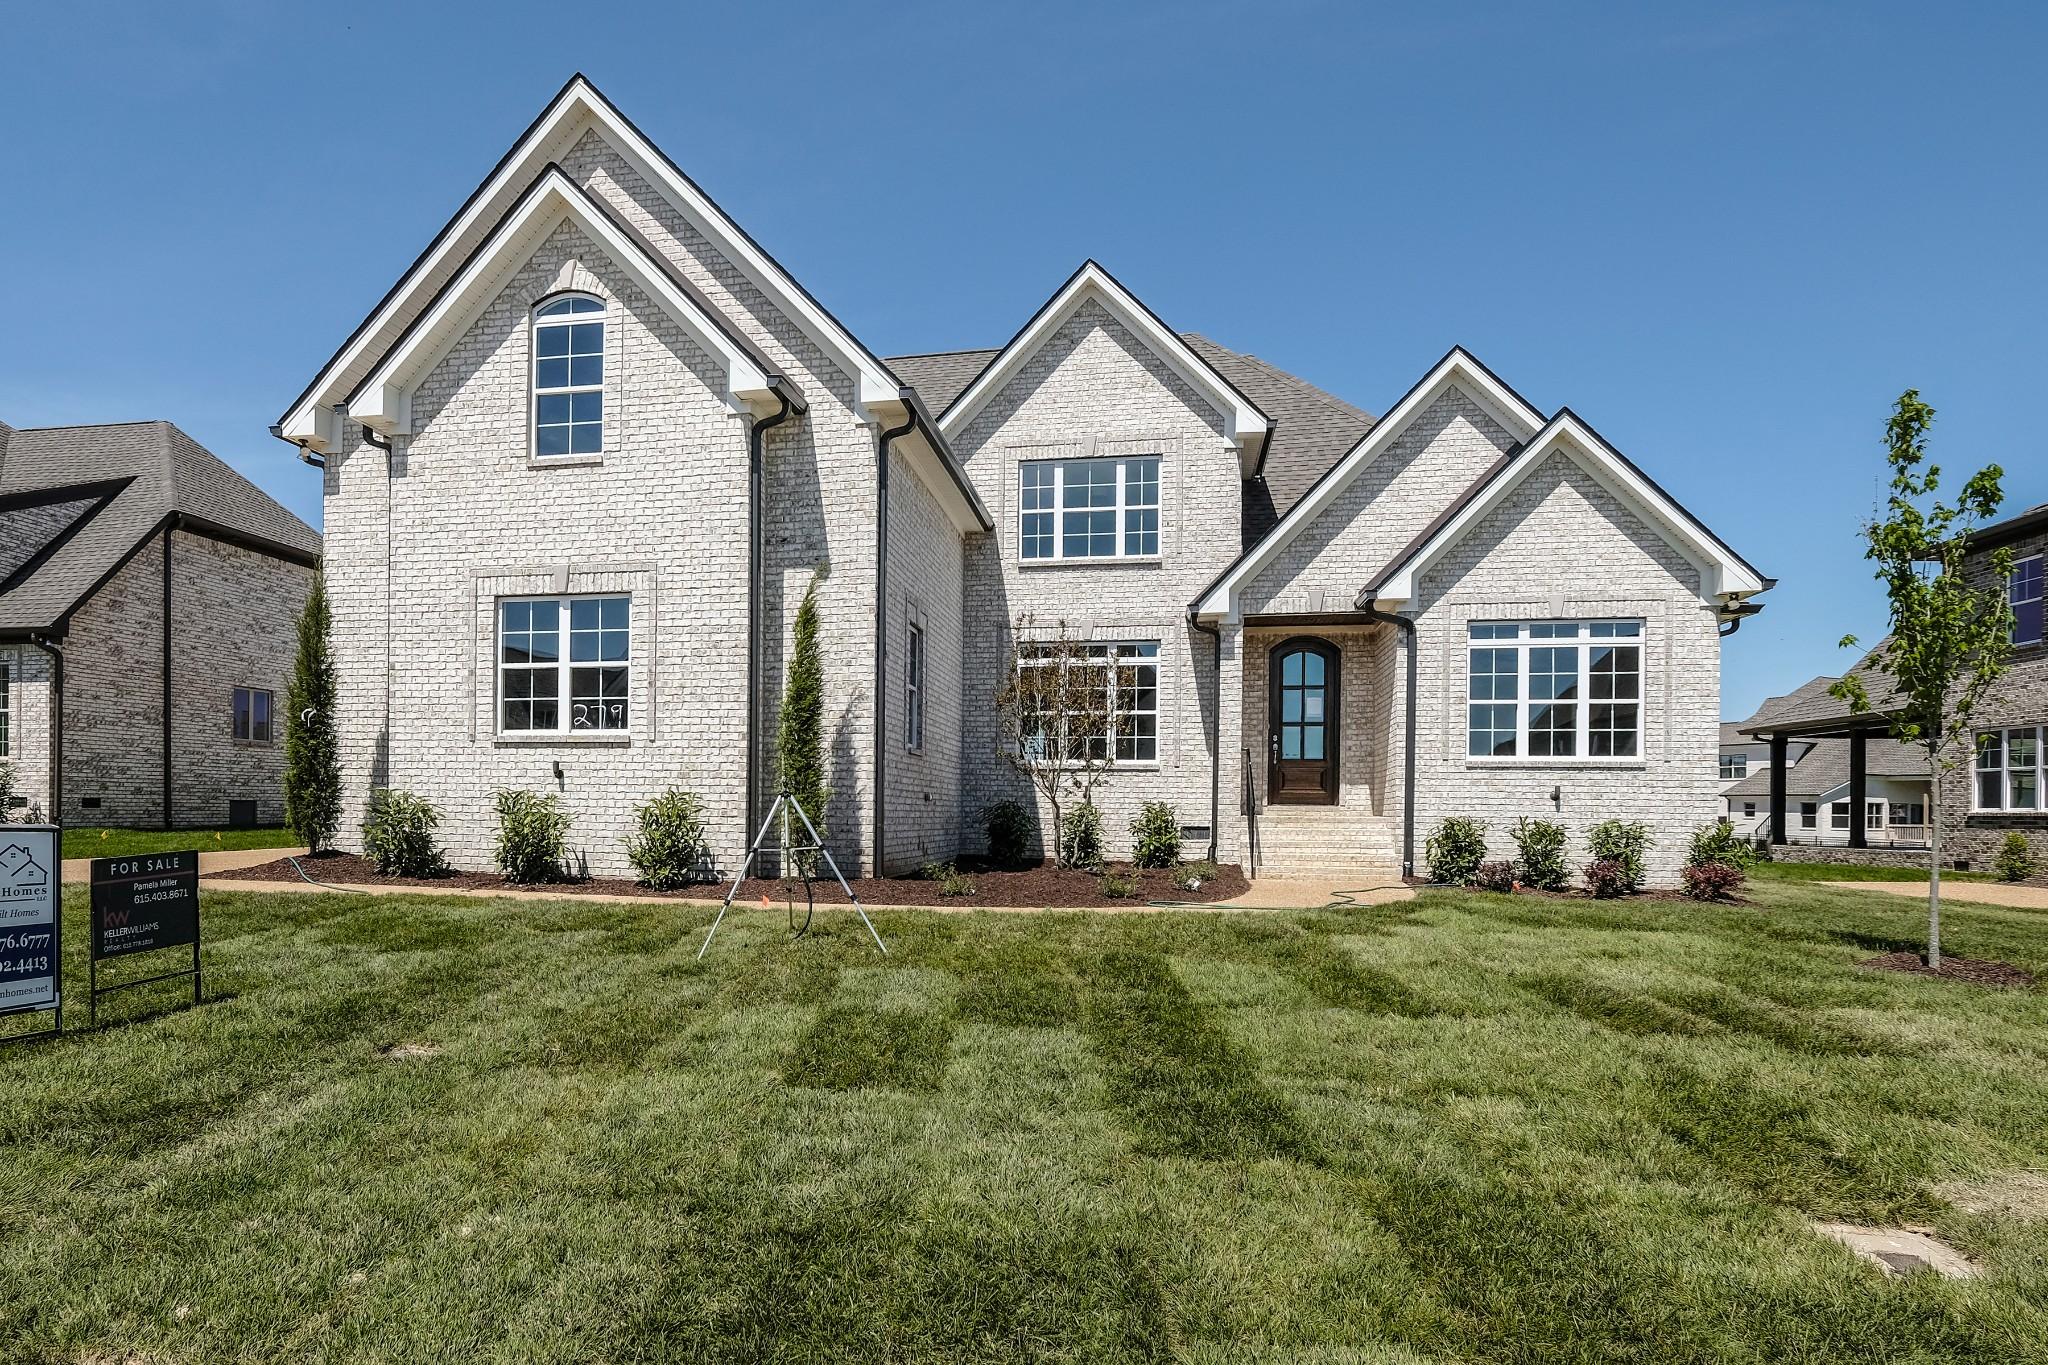 2040 Autumn Ridge Way (Lot 279), Spring Hill, TN 37174 - Spring Hill, TN real estate listing